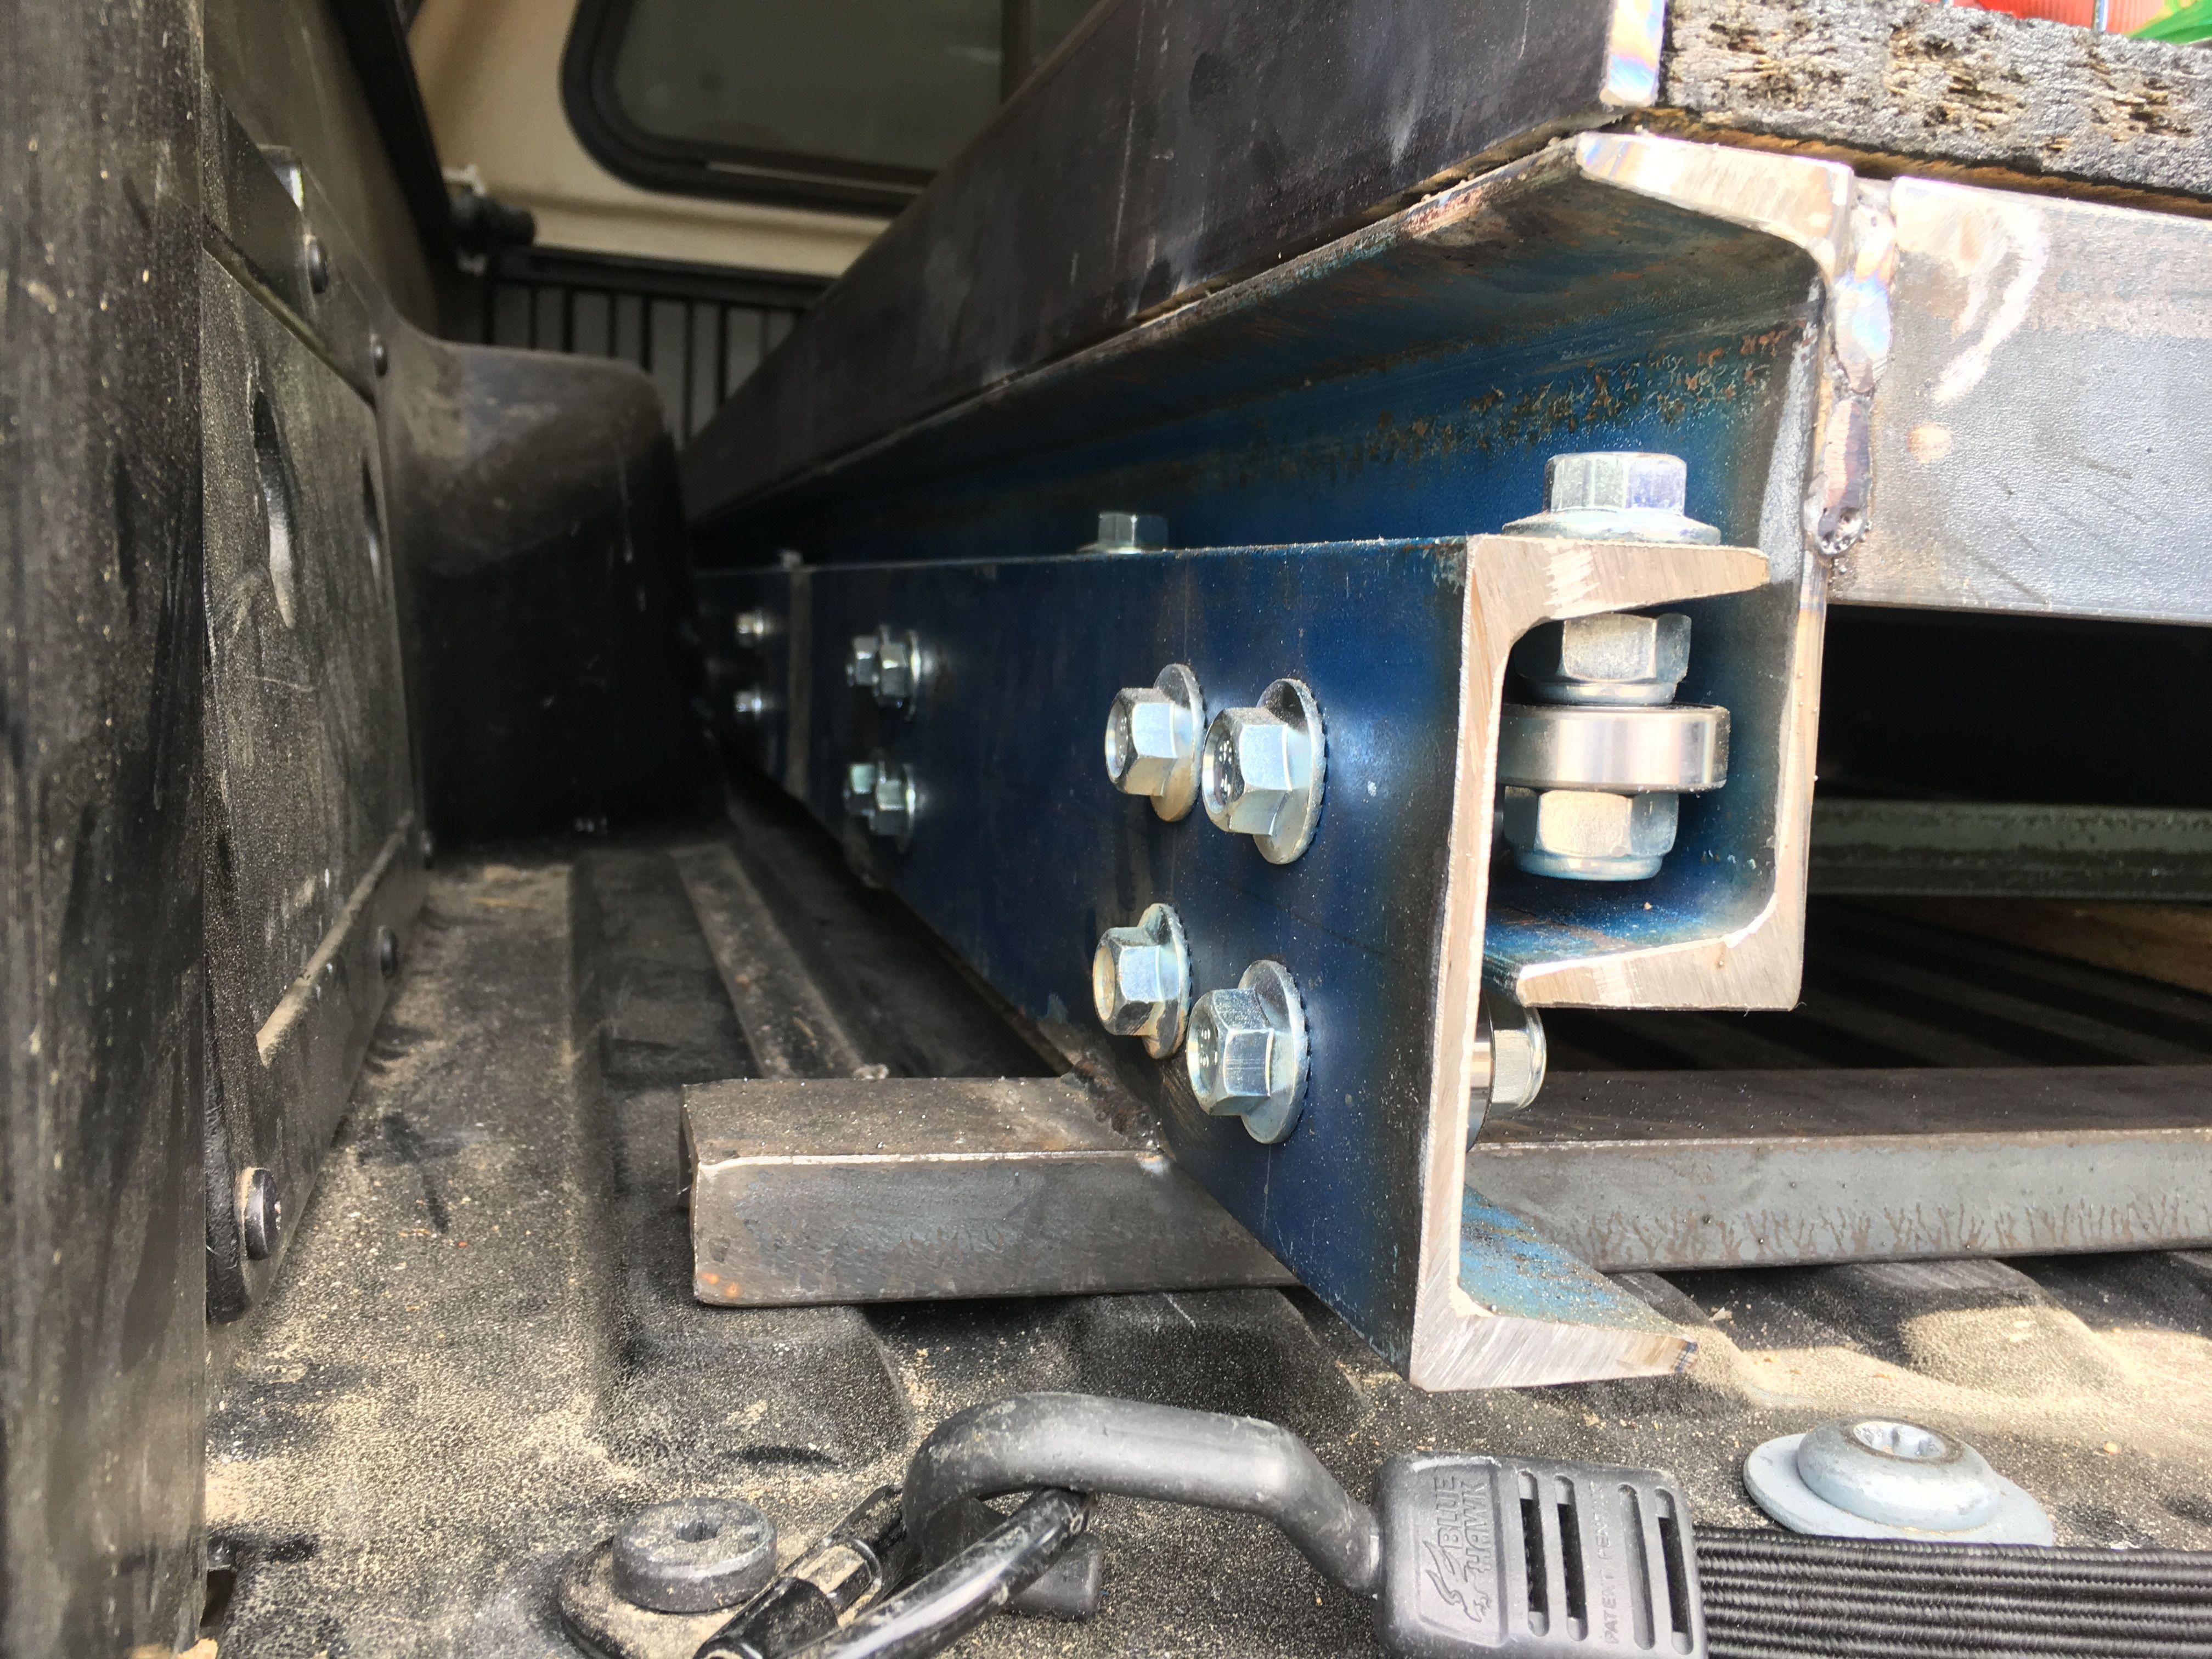 Pin by Dan Kellogg on DIY Sliding Truck Bed Welding